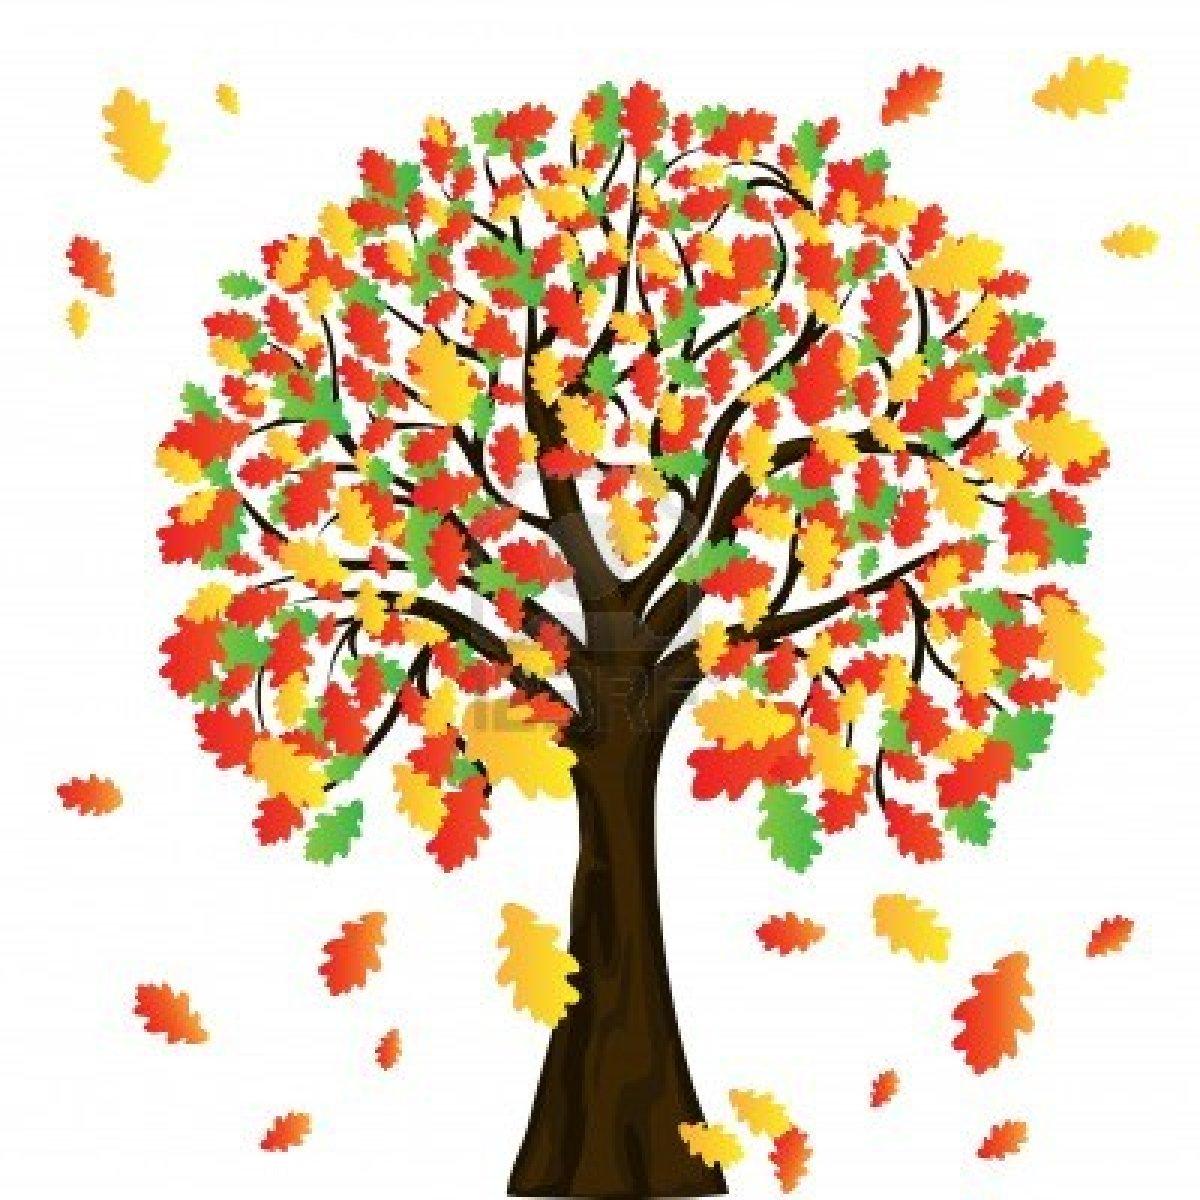 Fall Trees Clipart-Fall Trees Clipart-13